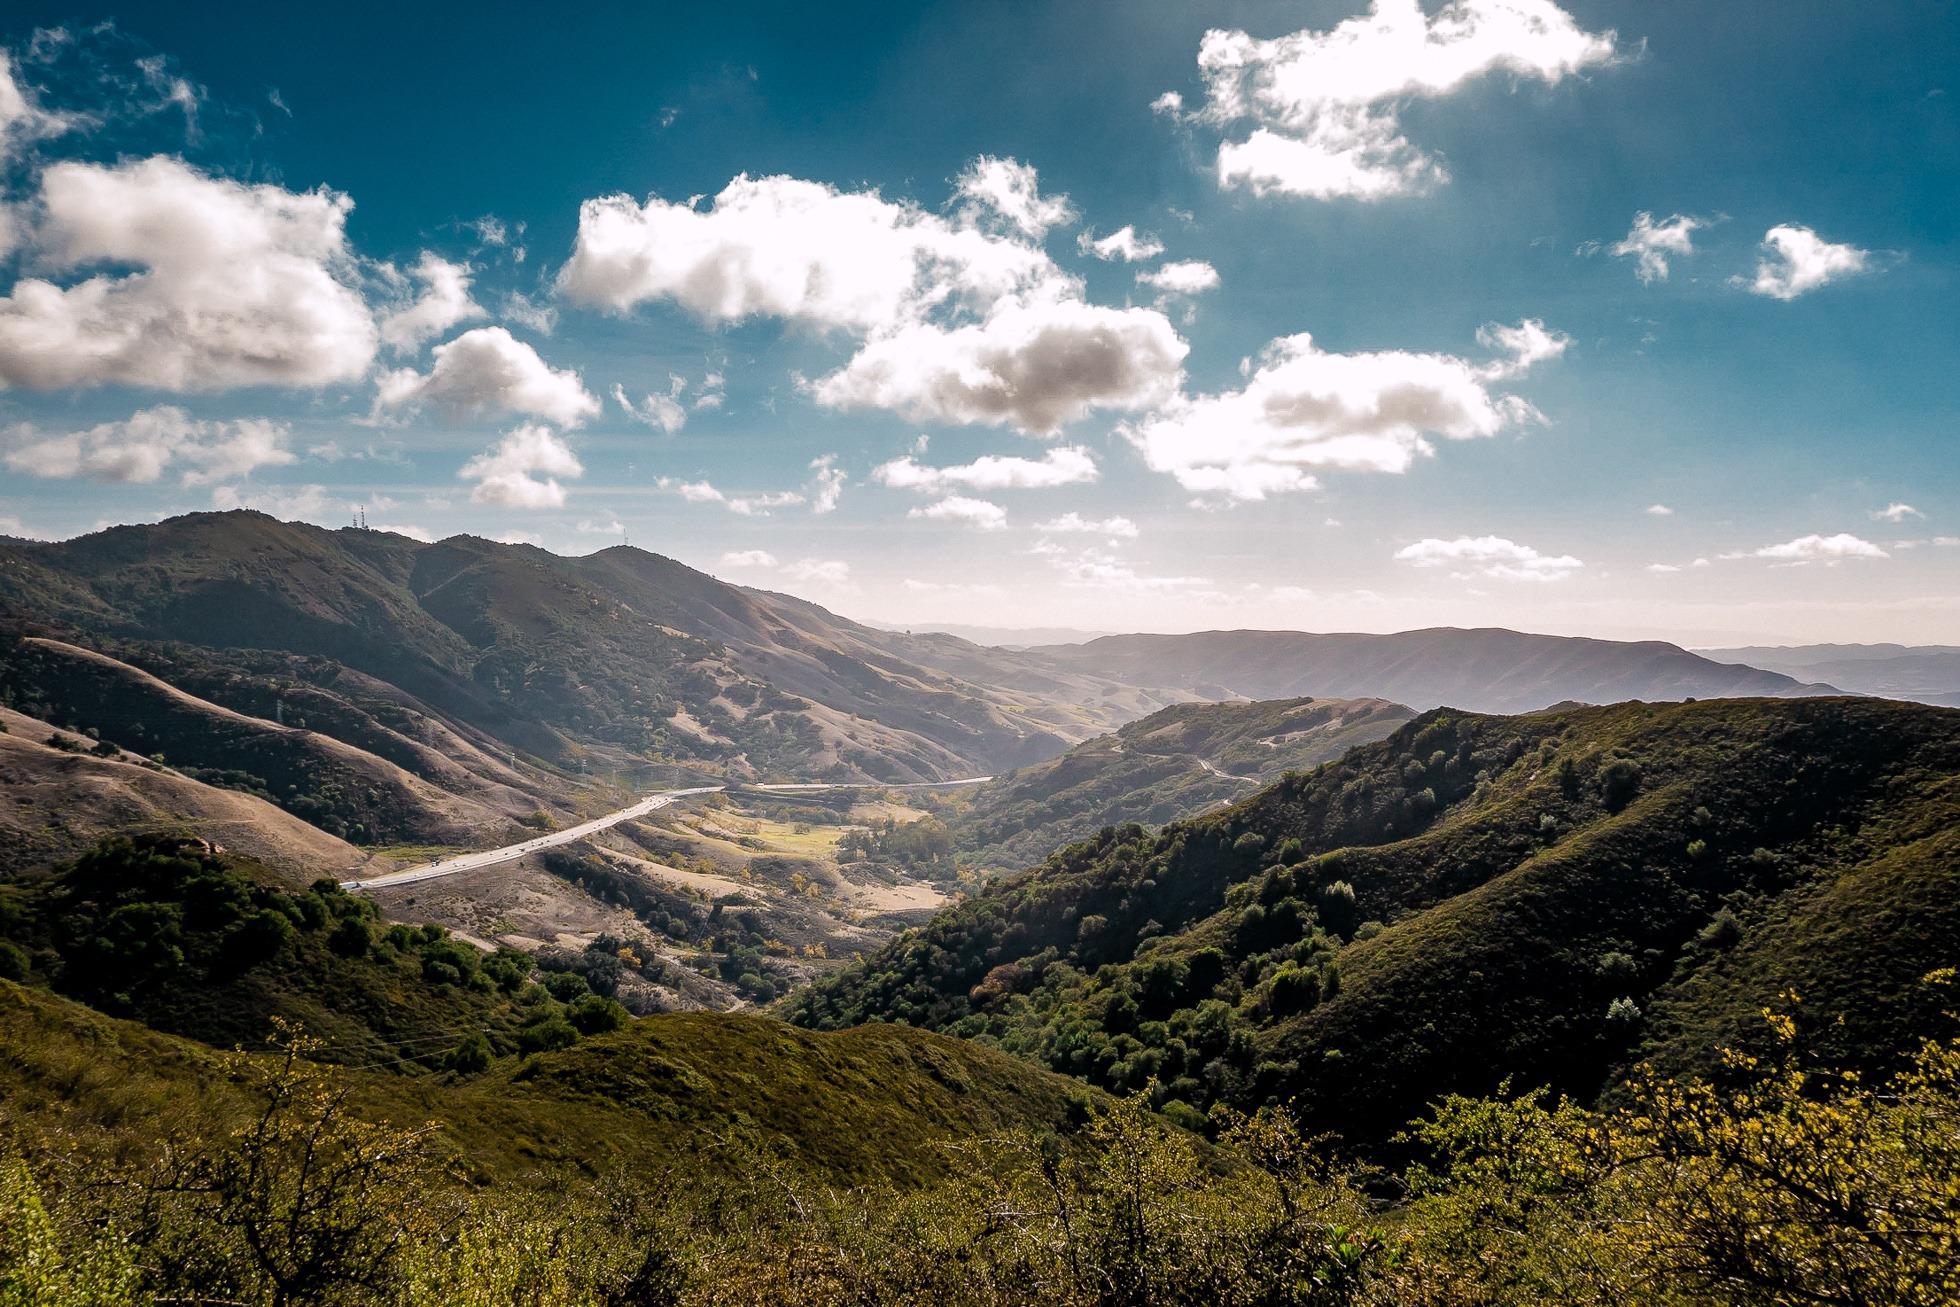 Cuestra Ridge, Los Padres National Forest, California